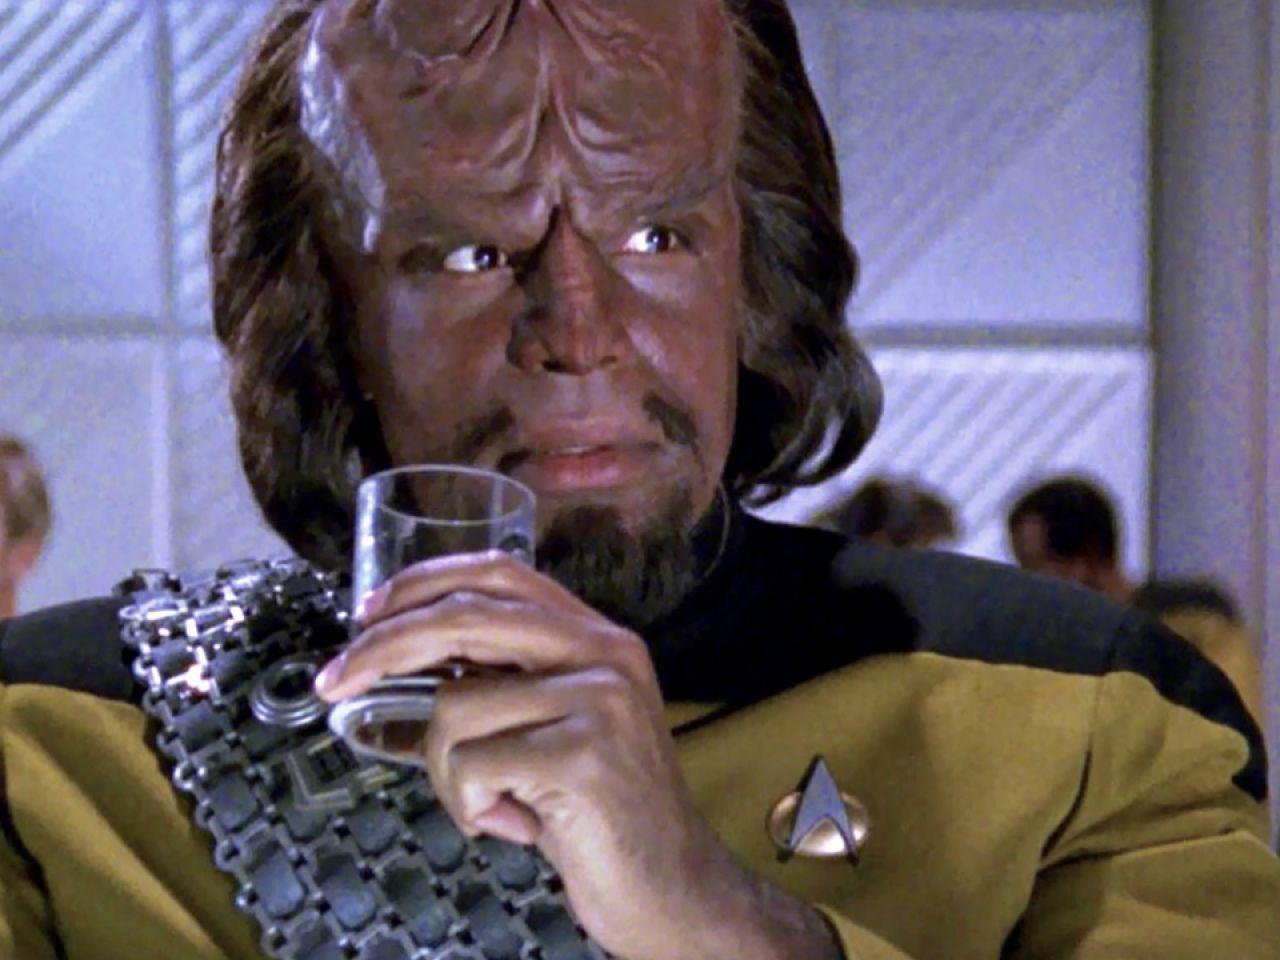 Arriva il vino da veri Klingon thumbnail